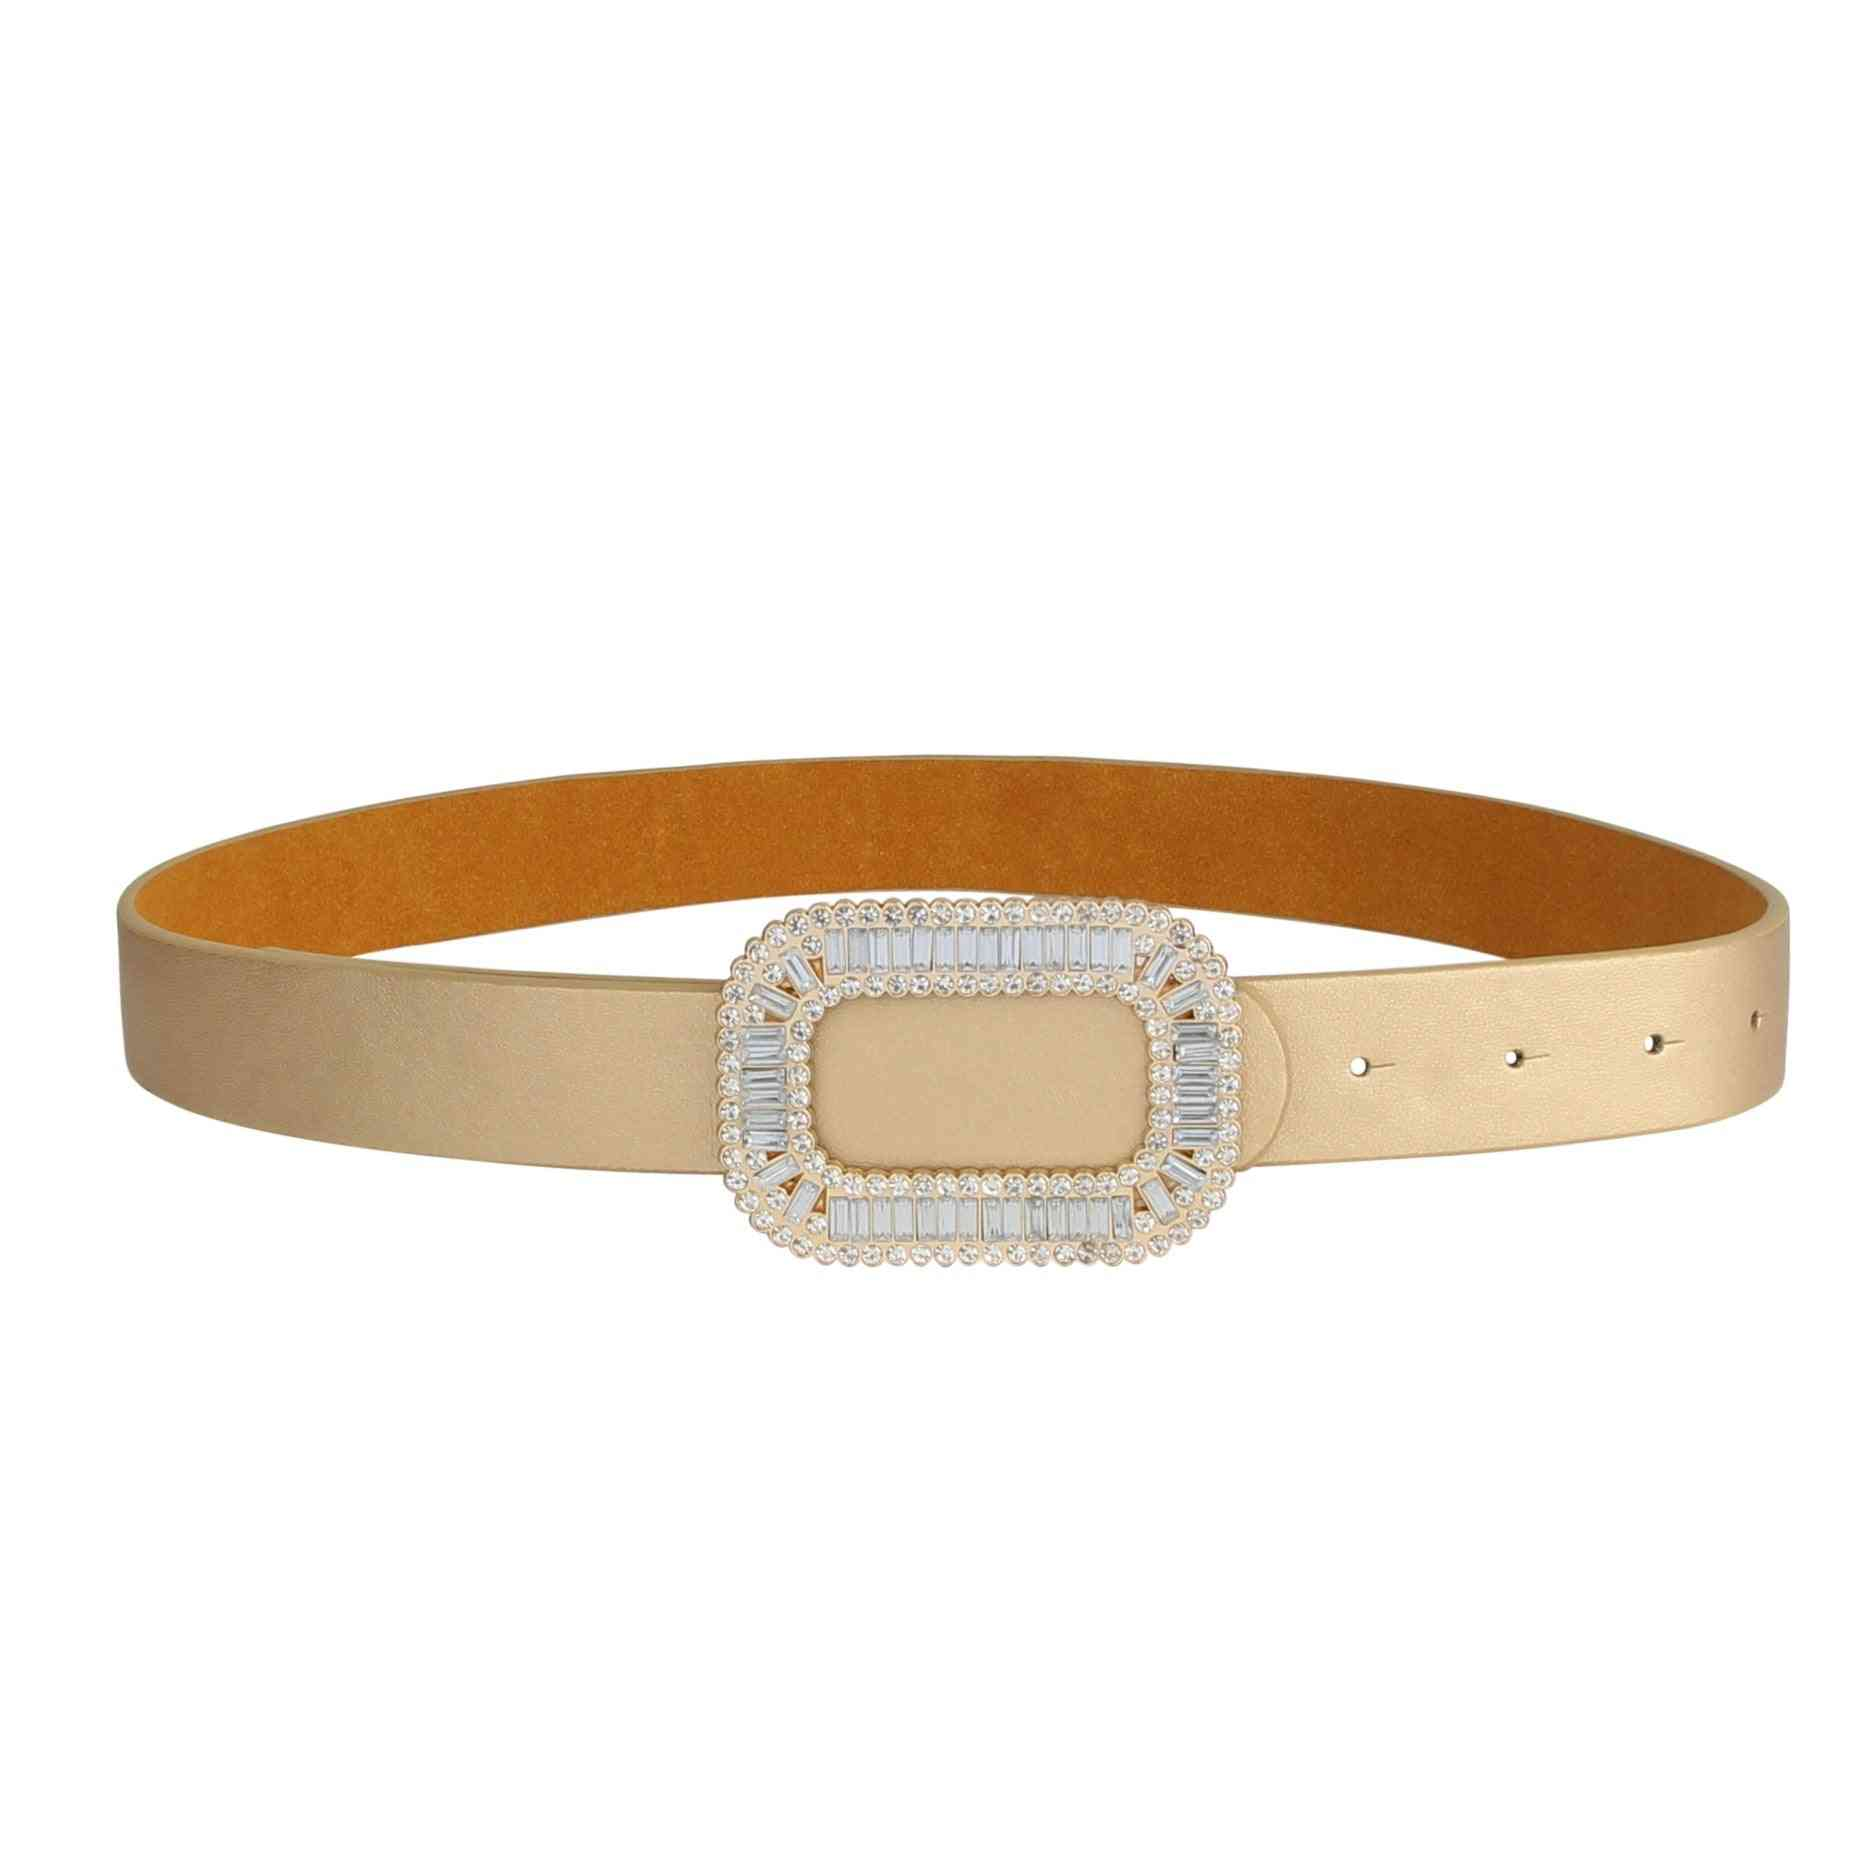 Crystal Embedded Buckle Belt